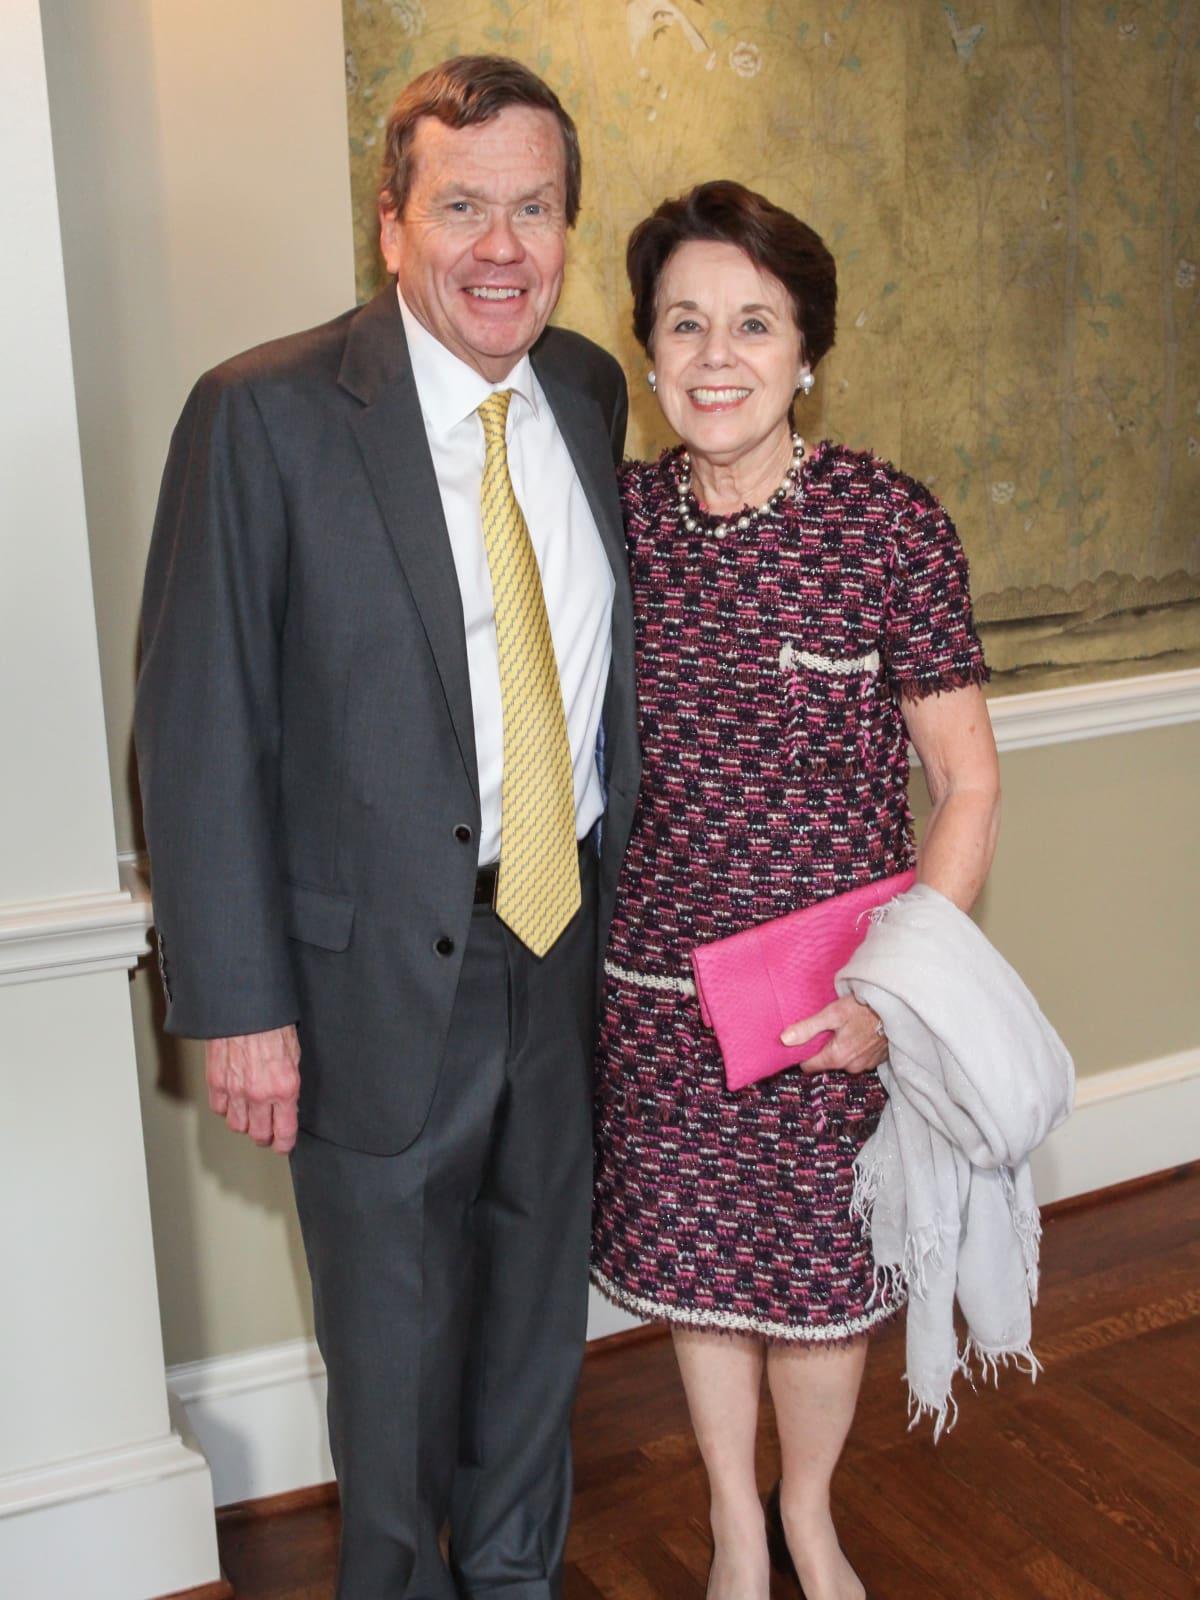 Jubilee of Caring/Richard and Ginni Mithoff